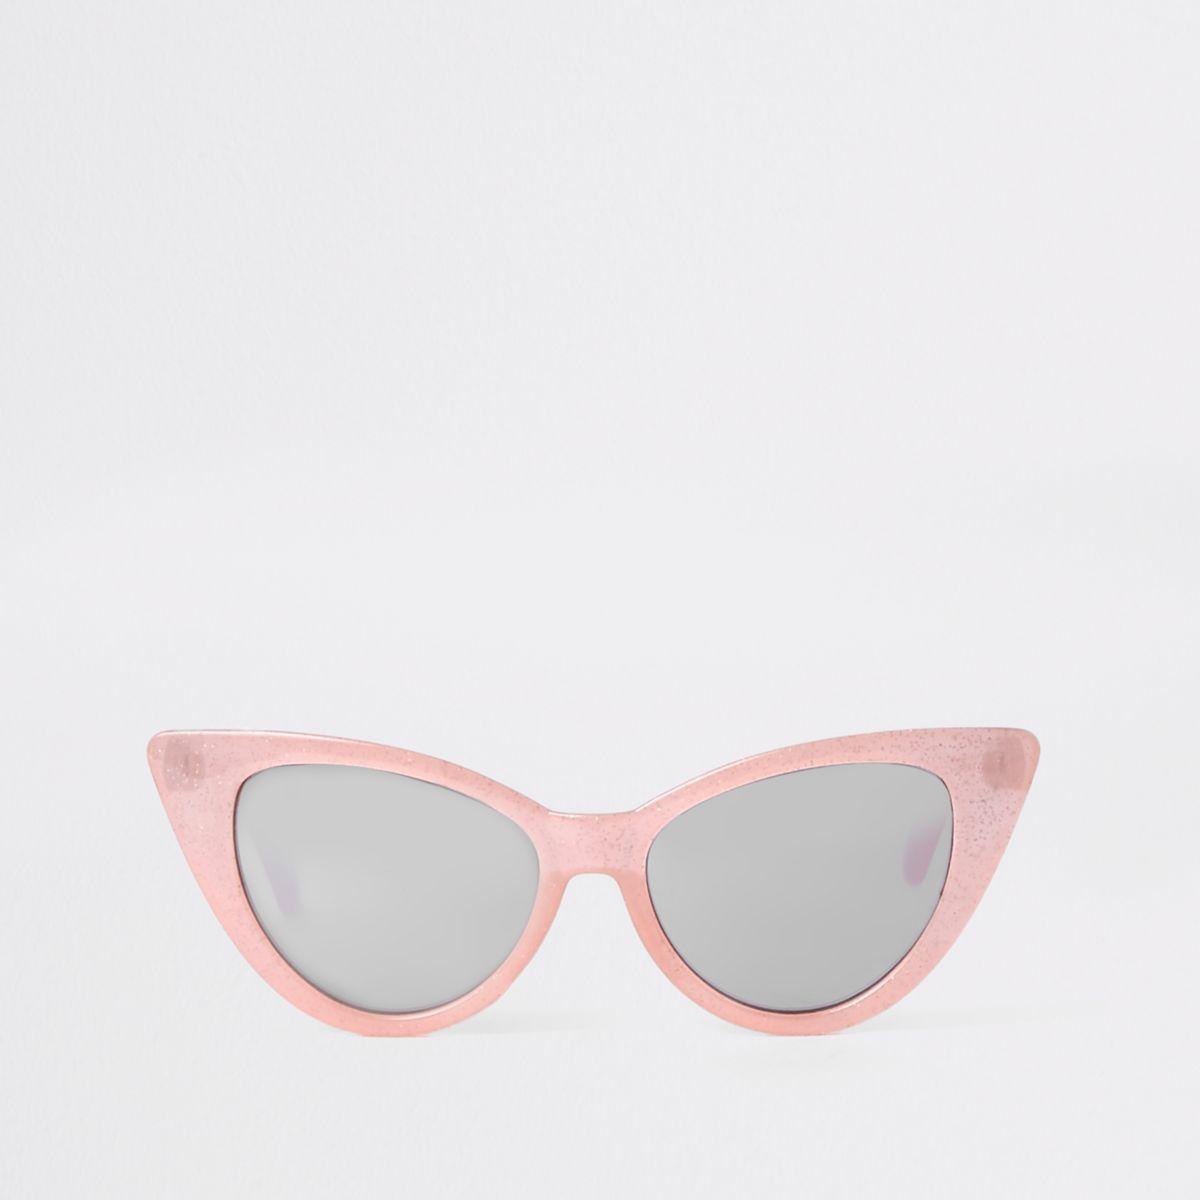 Girls pink glitter cat eye sunglasses